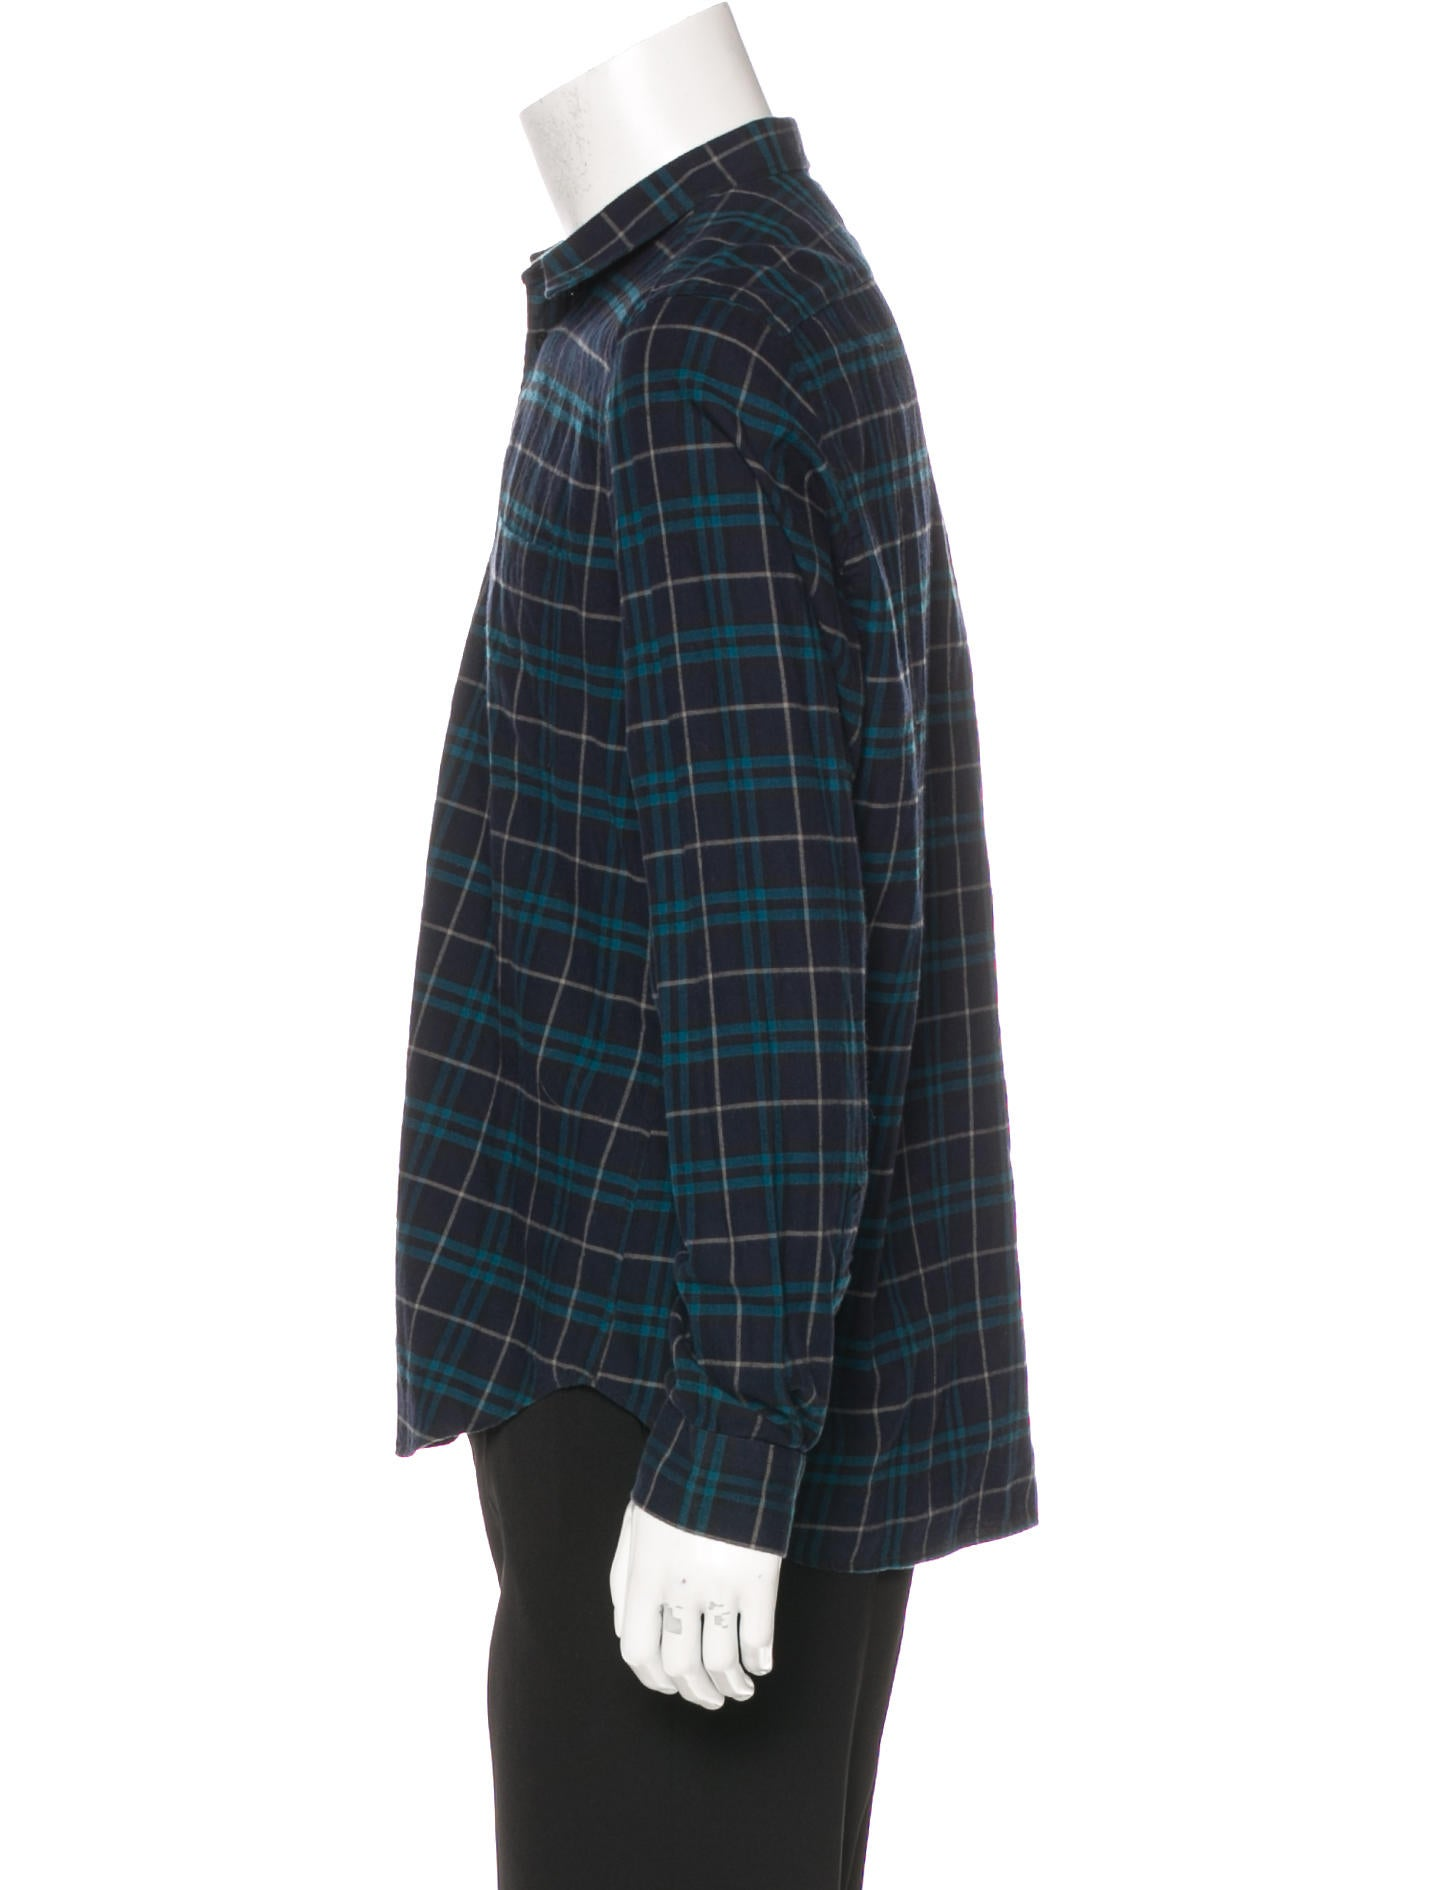 Burberry Brit Wool Blend Plaid Woven Shirt Clothing